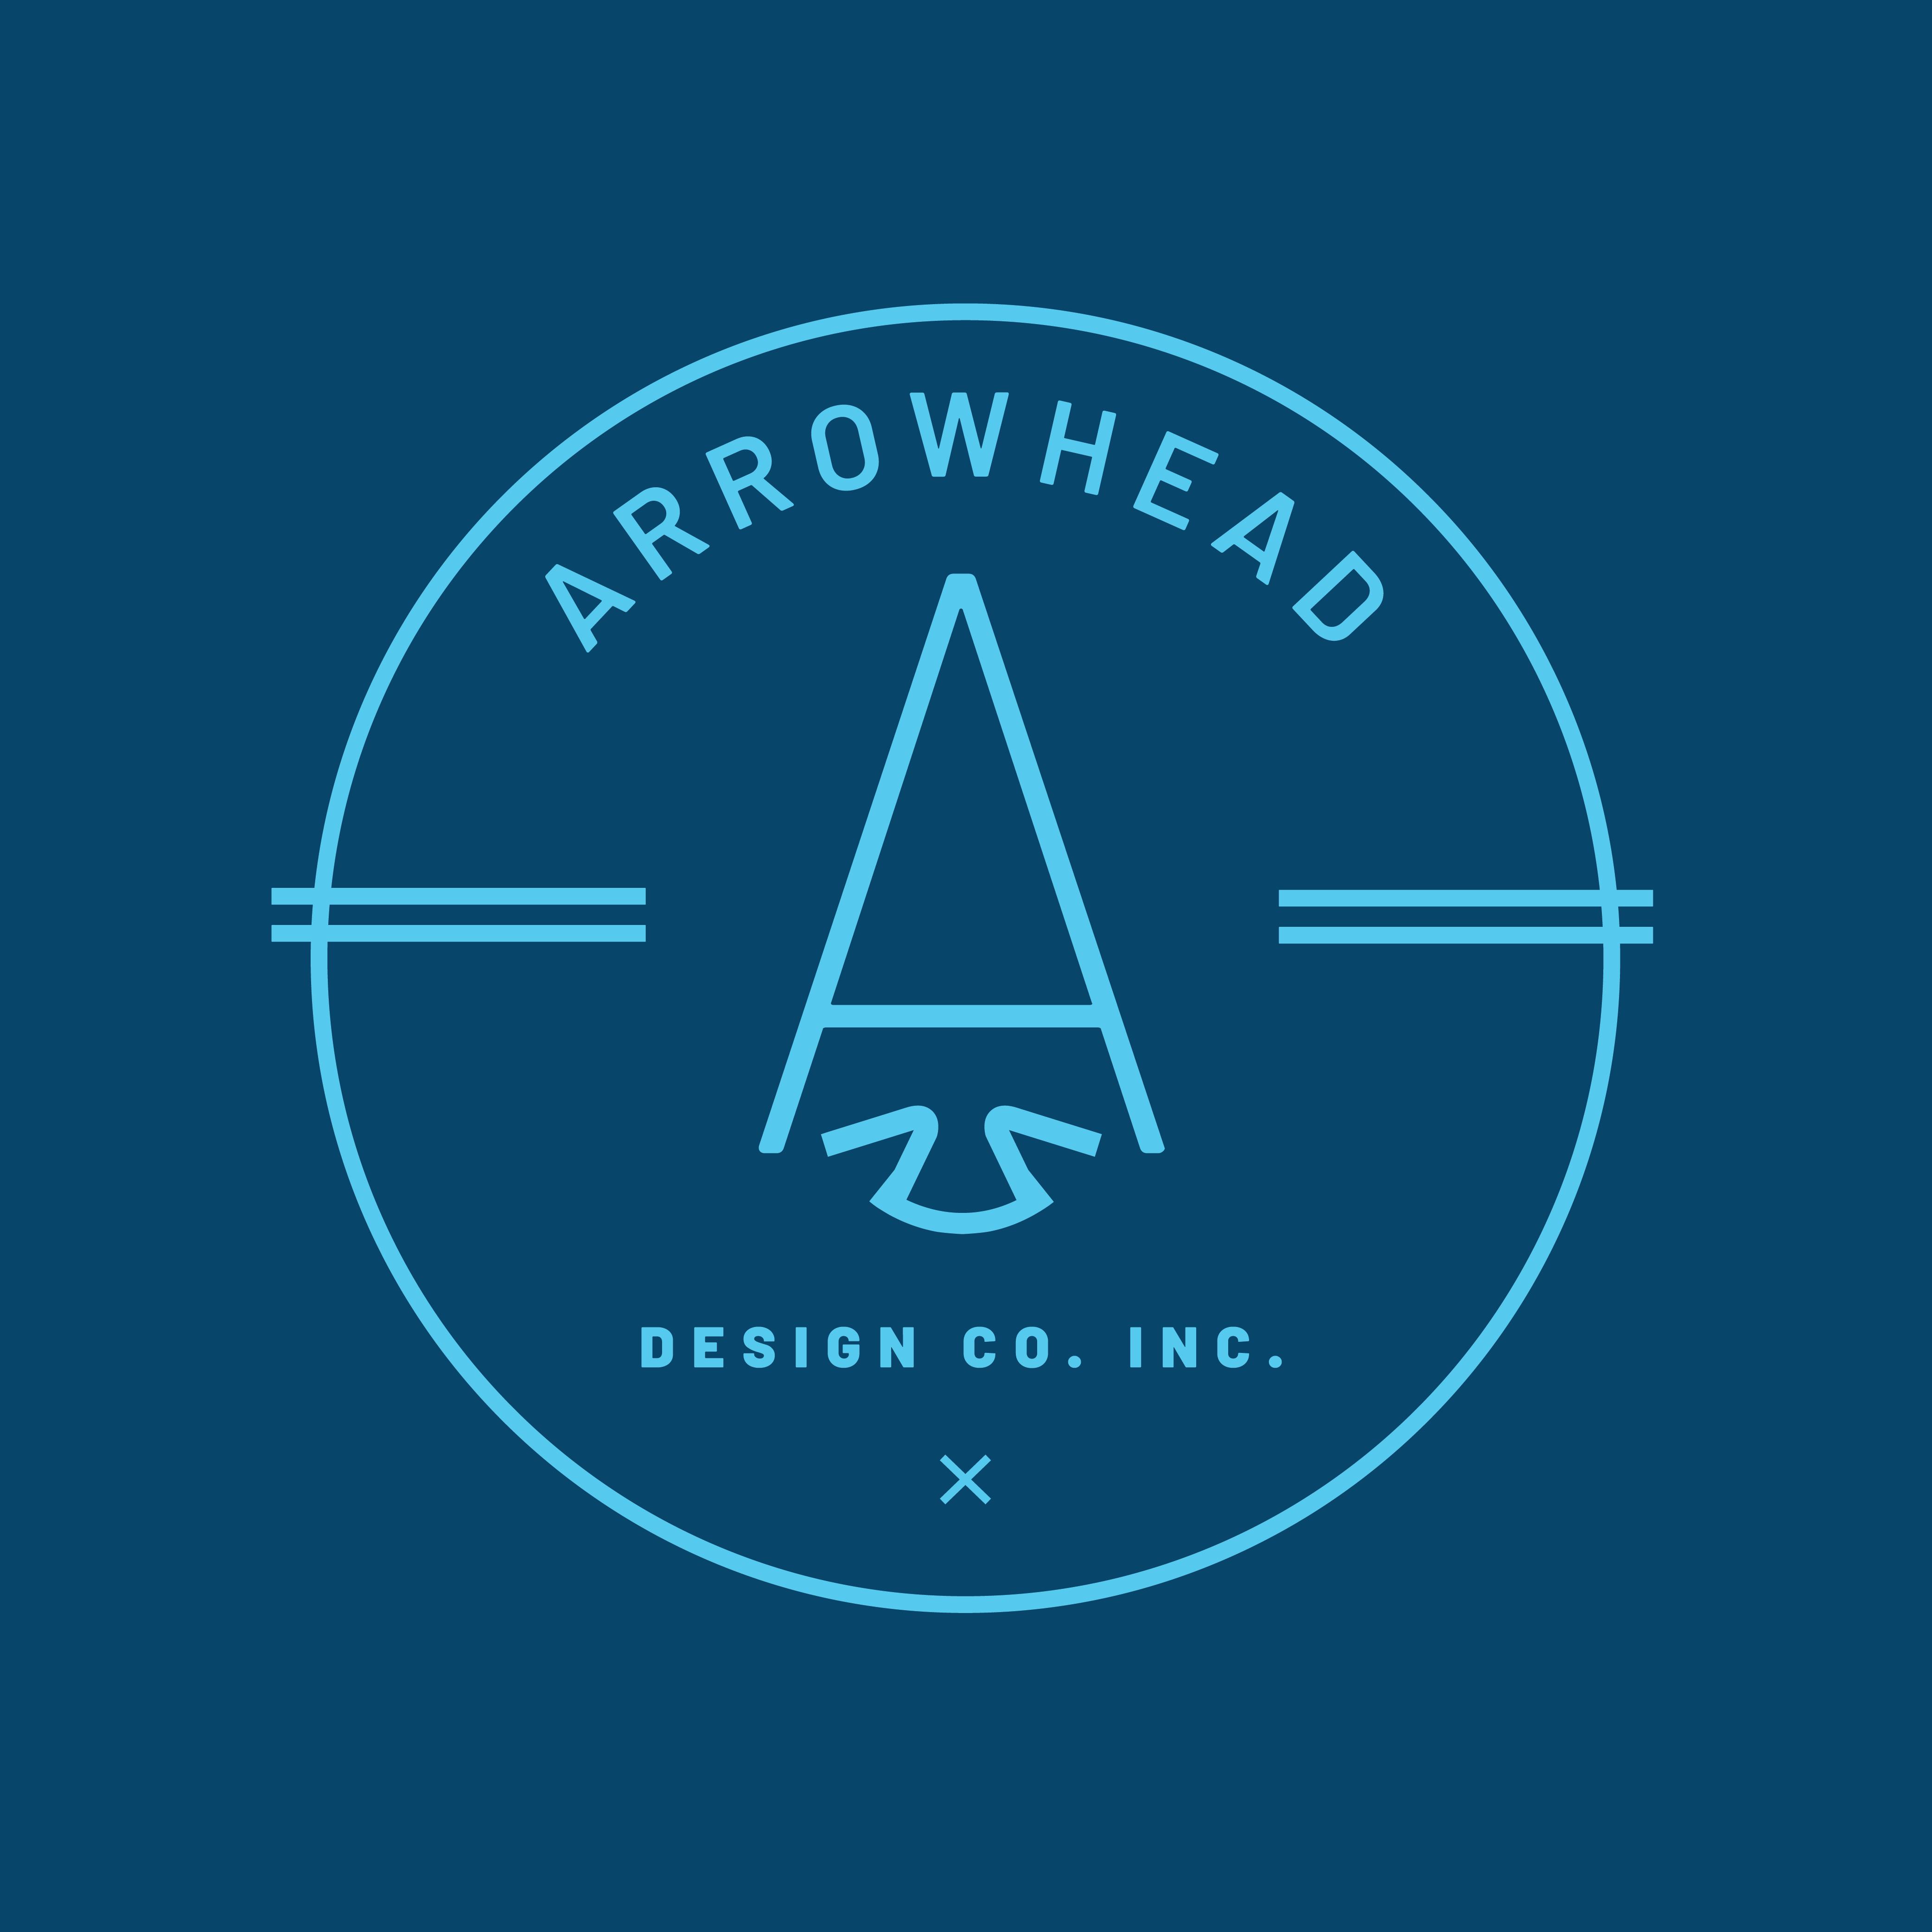 Arrowhead Design Co. Inc. Logo